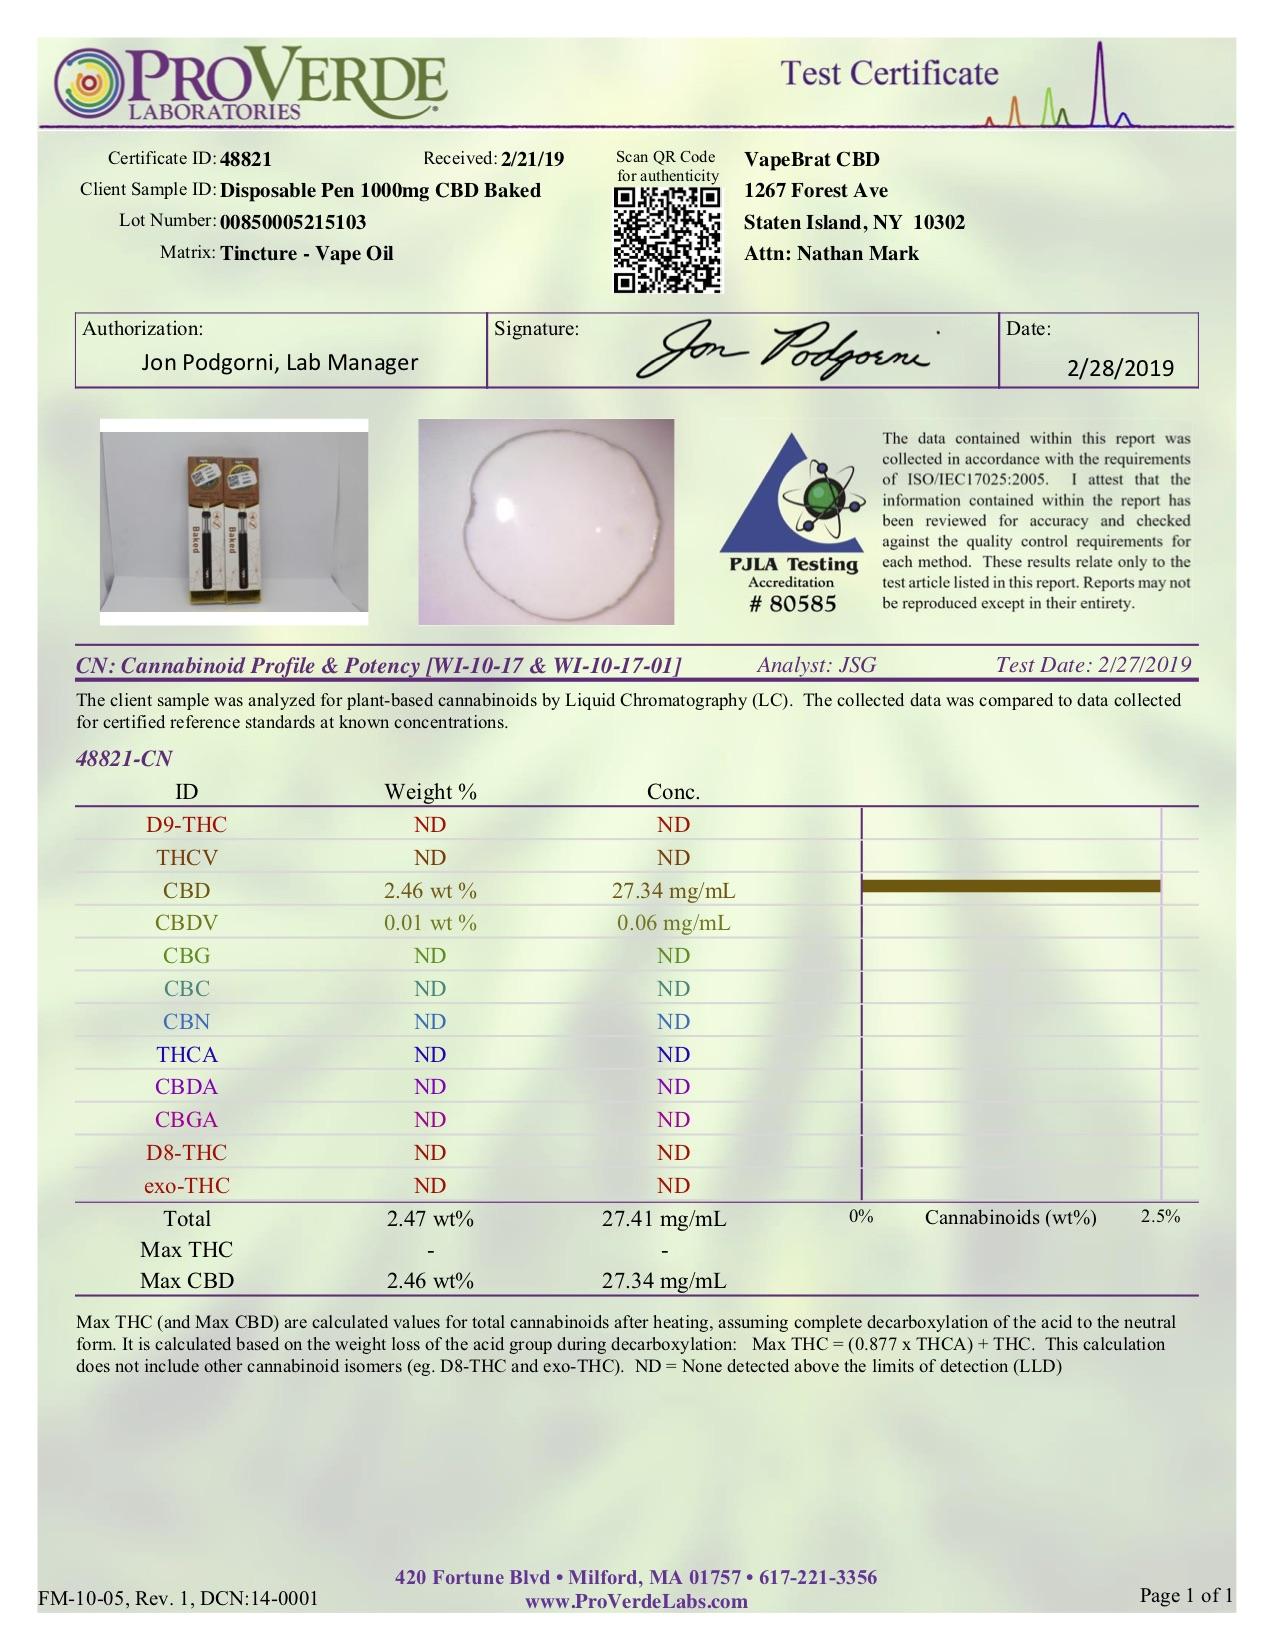 48821-cn-disposable-pen-1000mg-cbd-baked.jpg